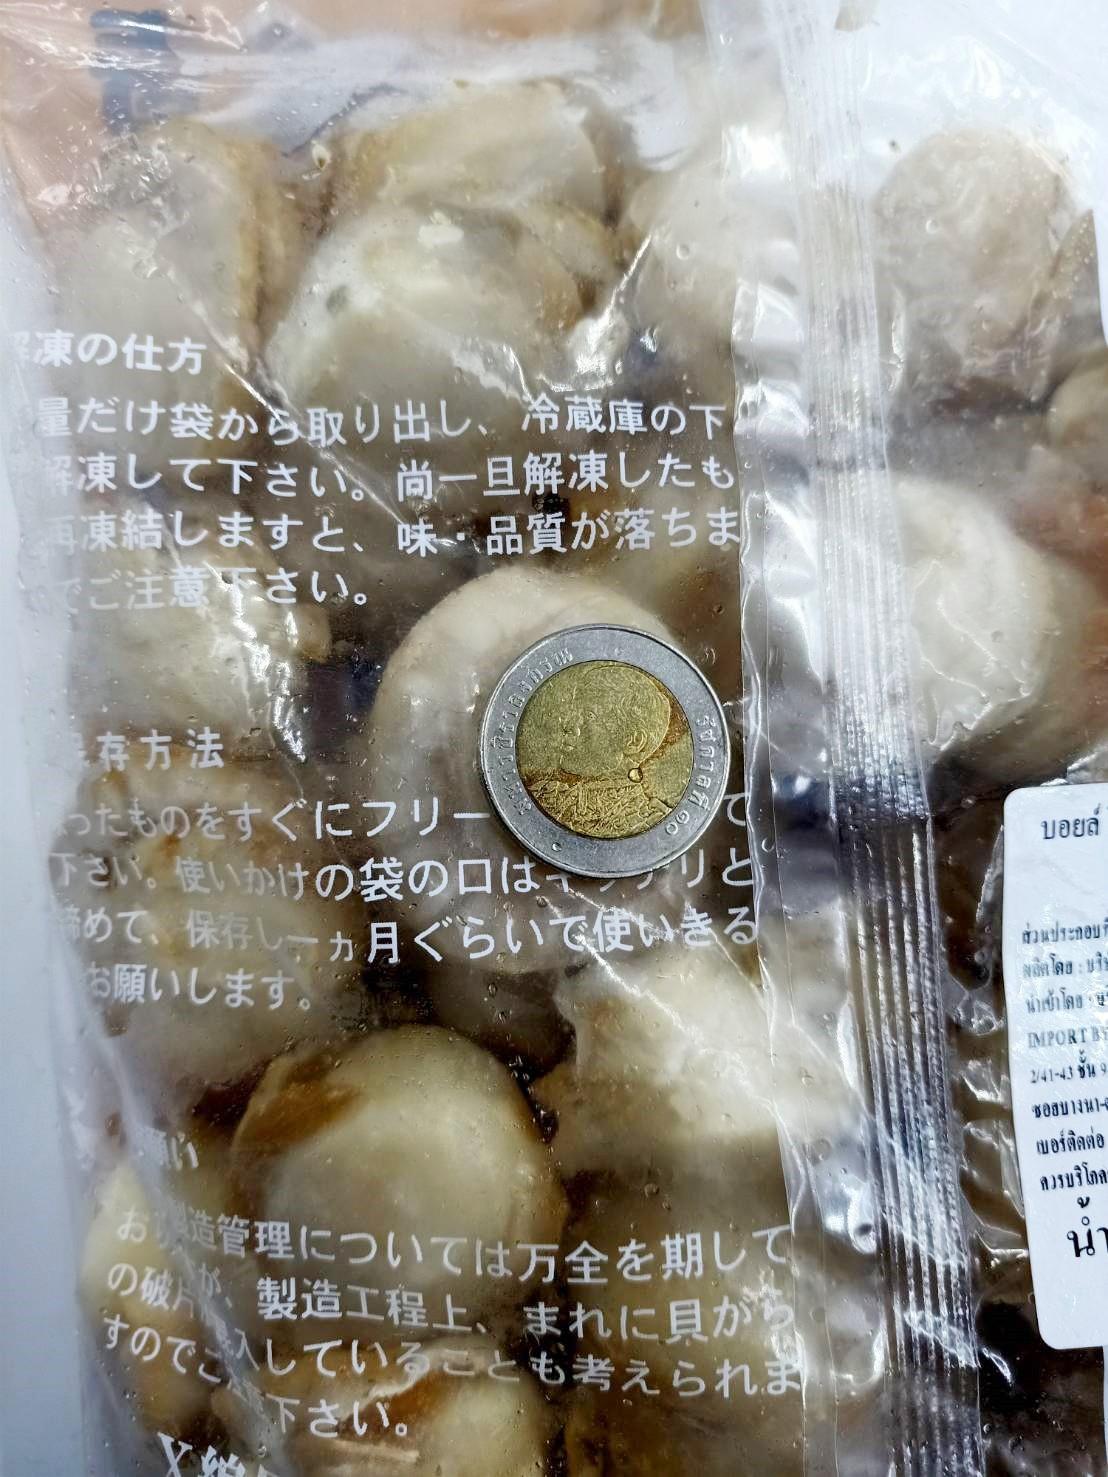 Boiled Scallop from Hokkaido (Hotate) Size 60-80 Pcs. / 1000g.